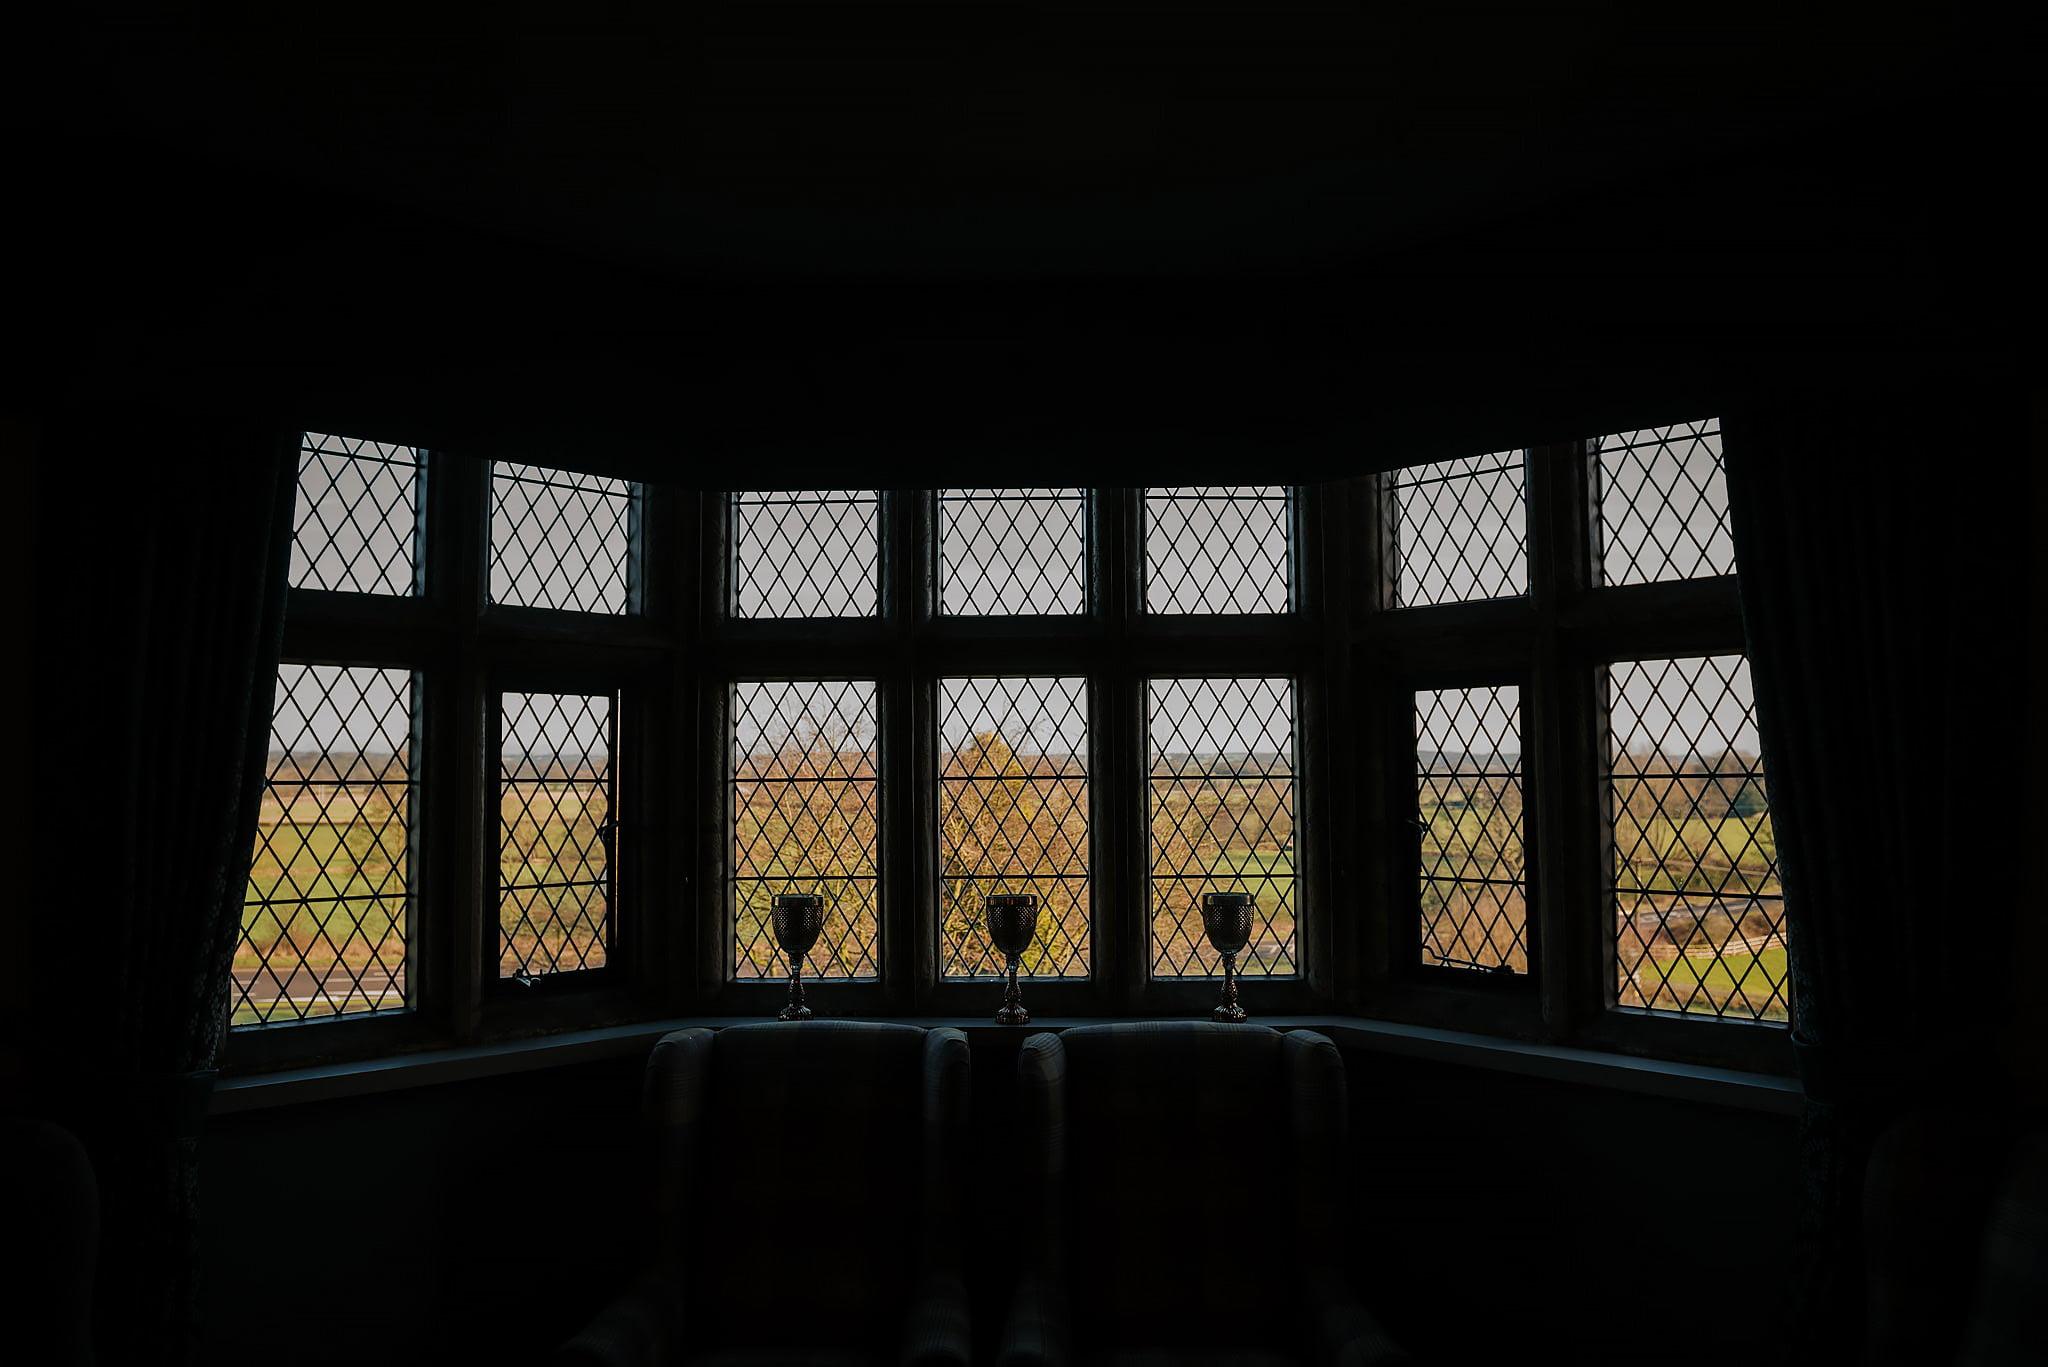 weston-hall-wedding-photography-staffordshire (6)